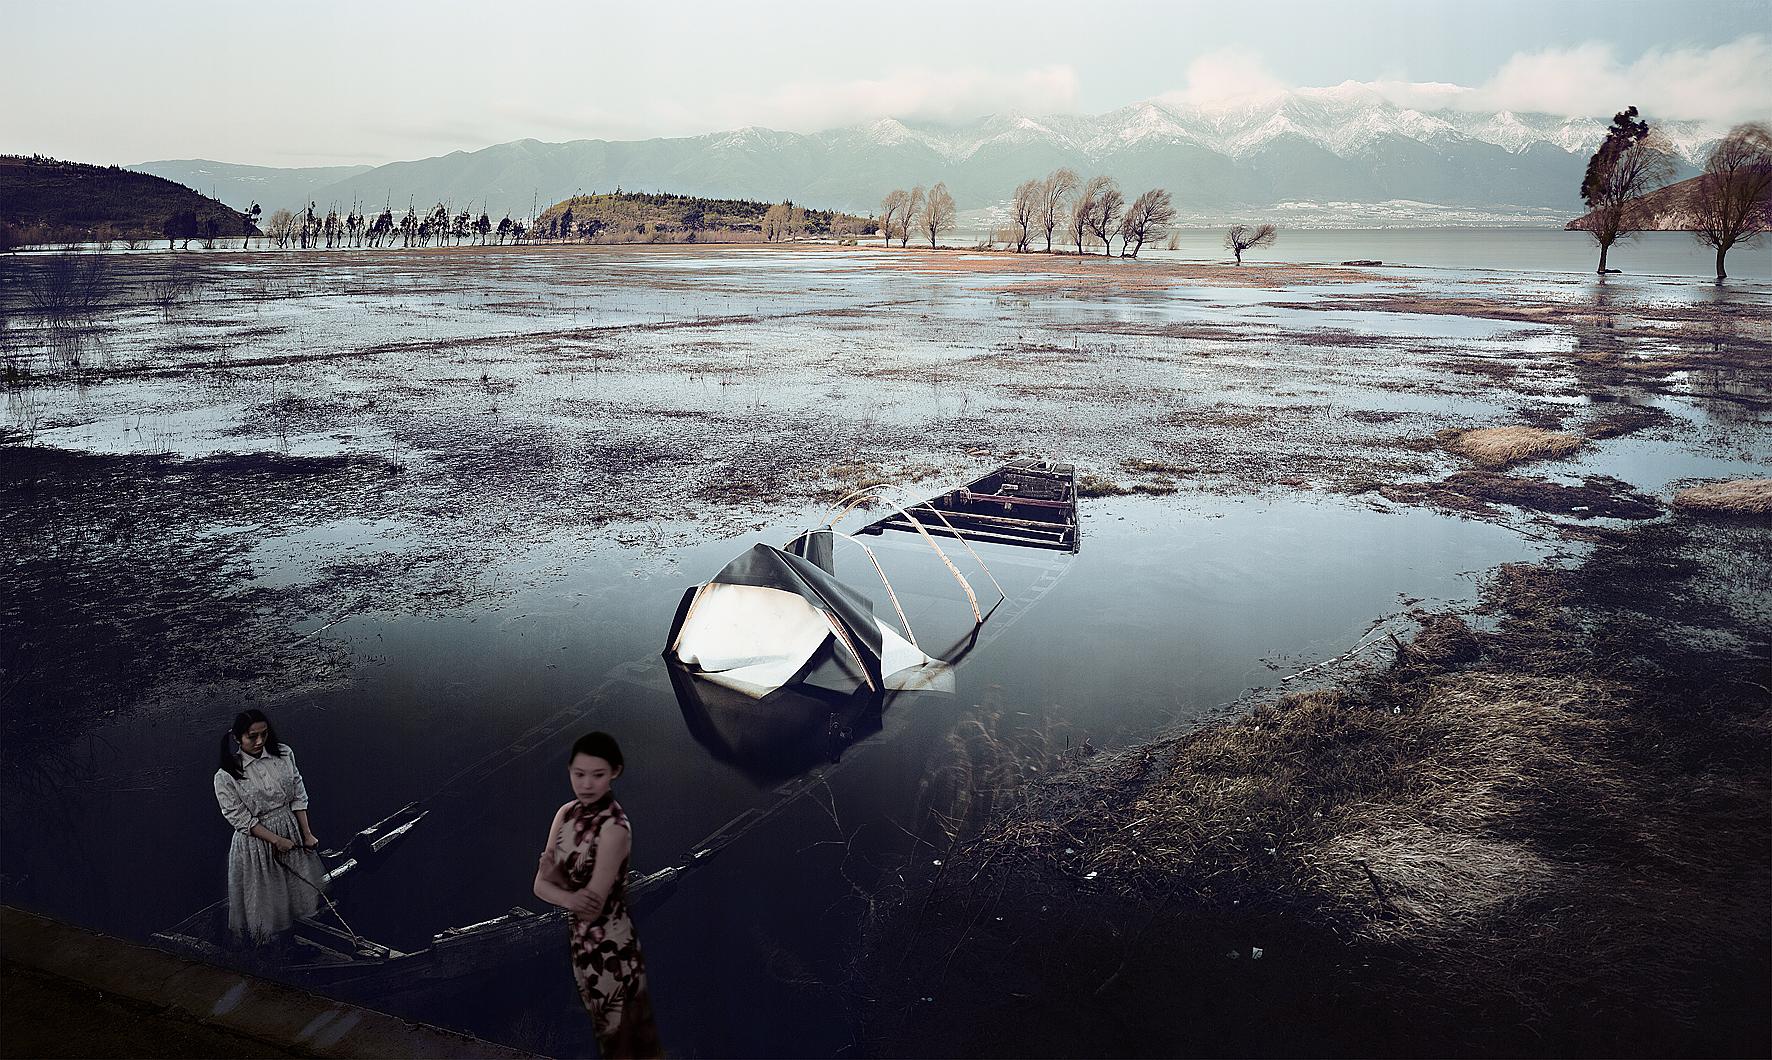 Abandoned Boat (Temptation Series), 2008, 110 x 180 cm, Chromogenic photograph (Edition 2 of 12)